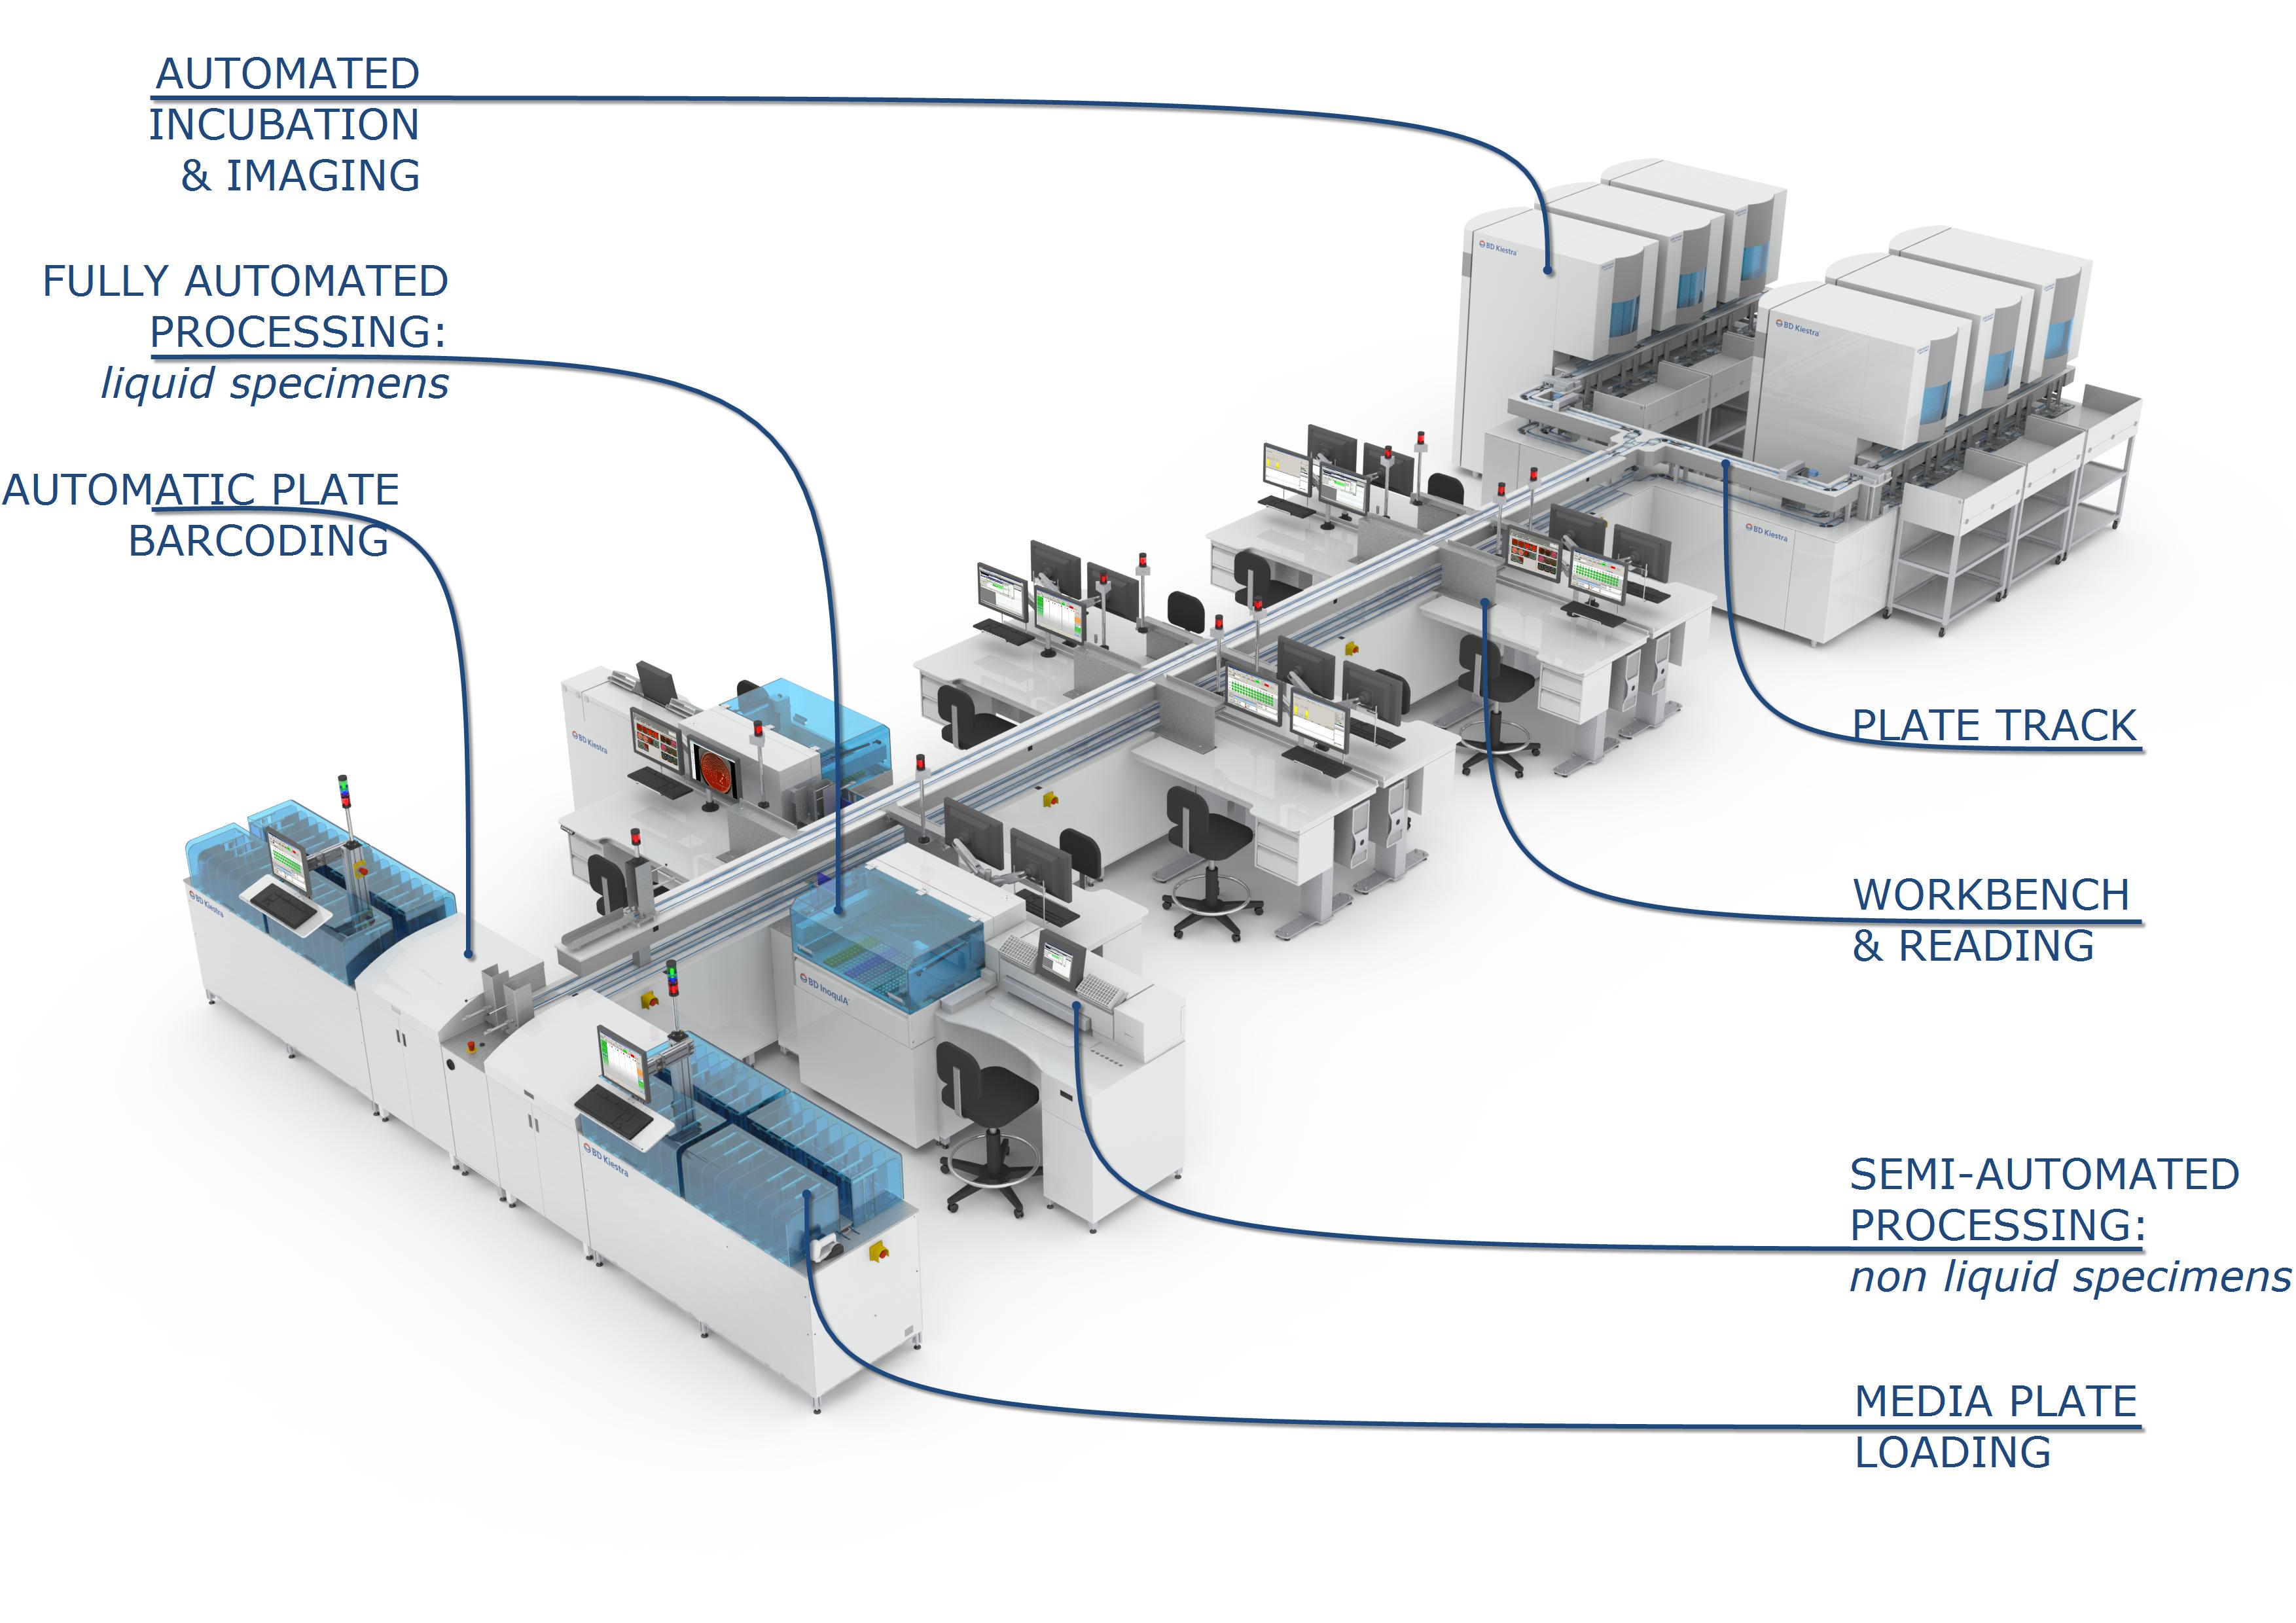 BD Kiestra™ Total Lab Automation